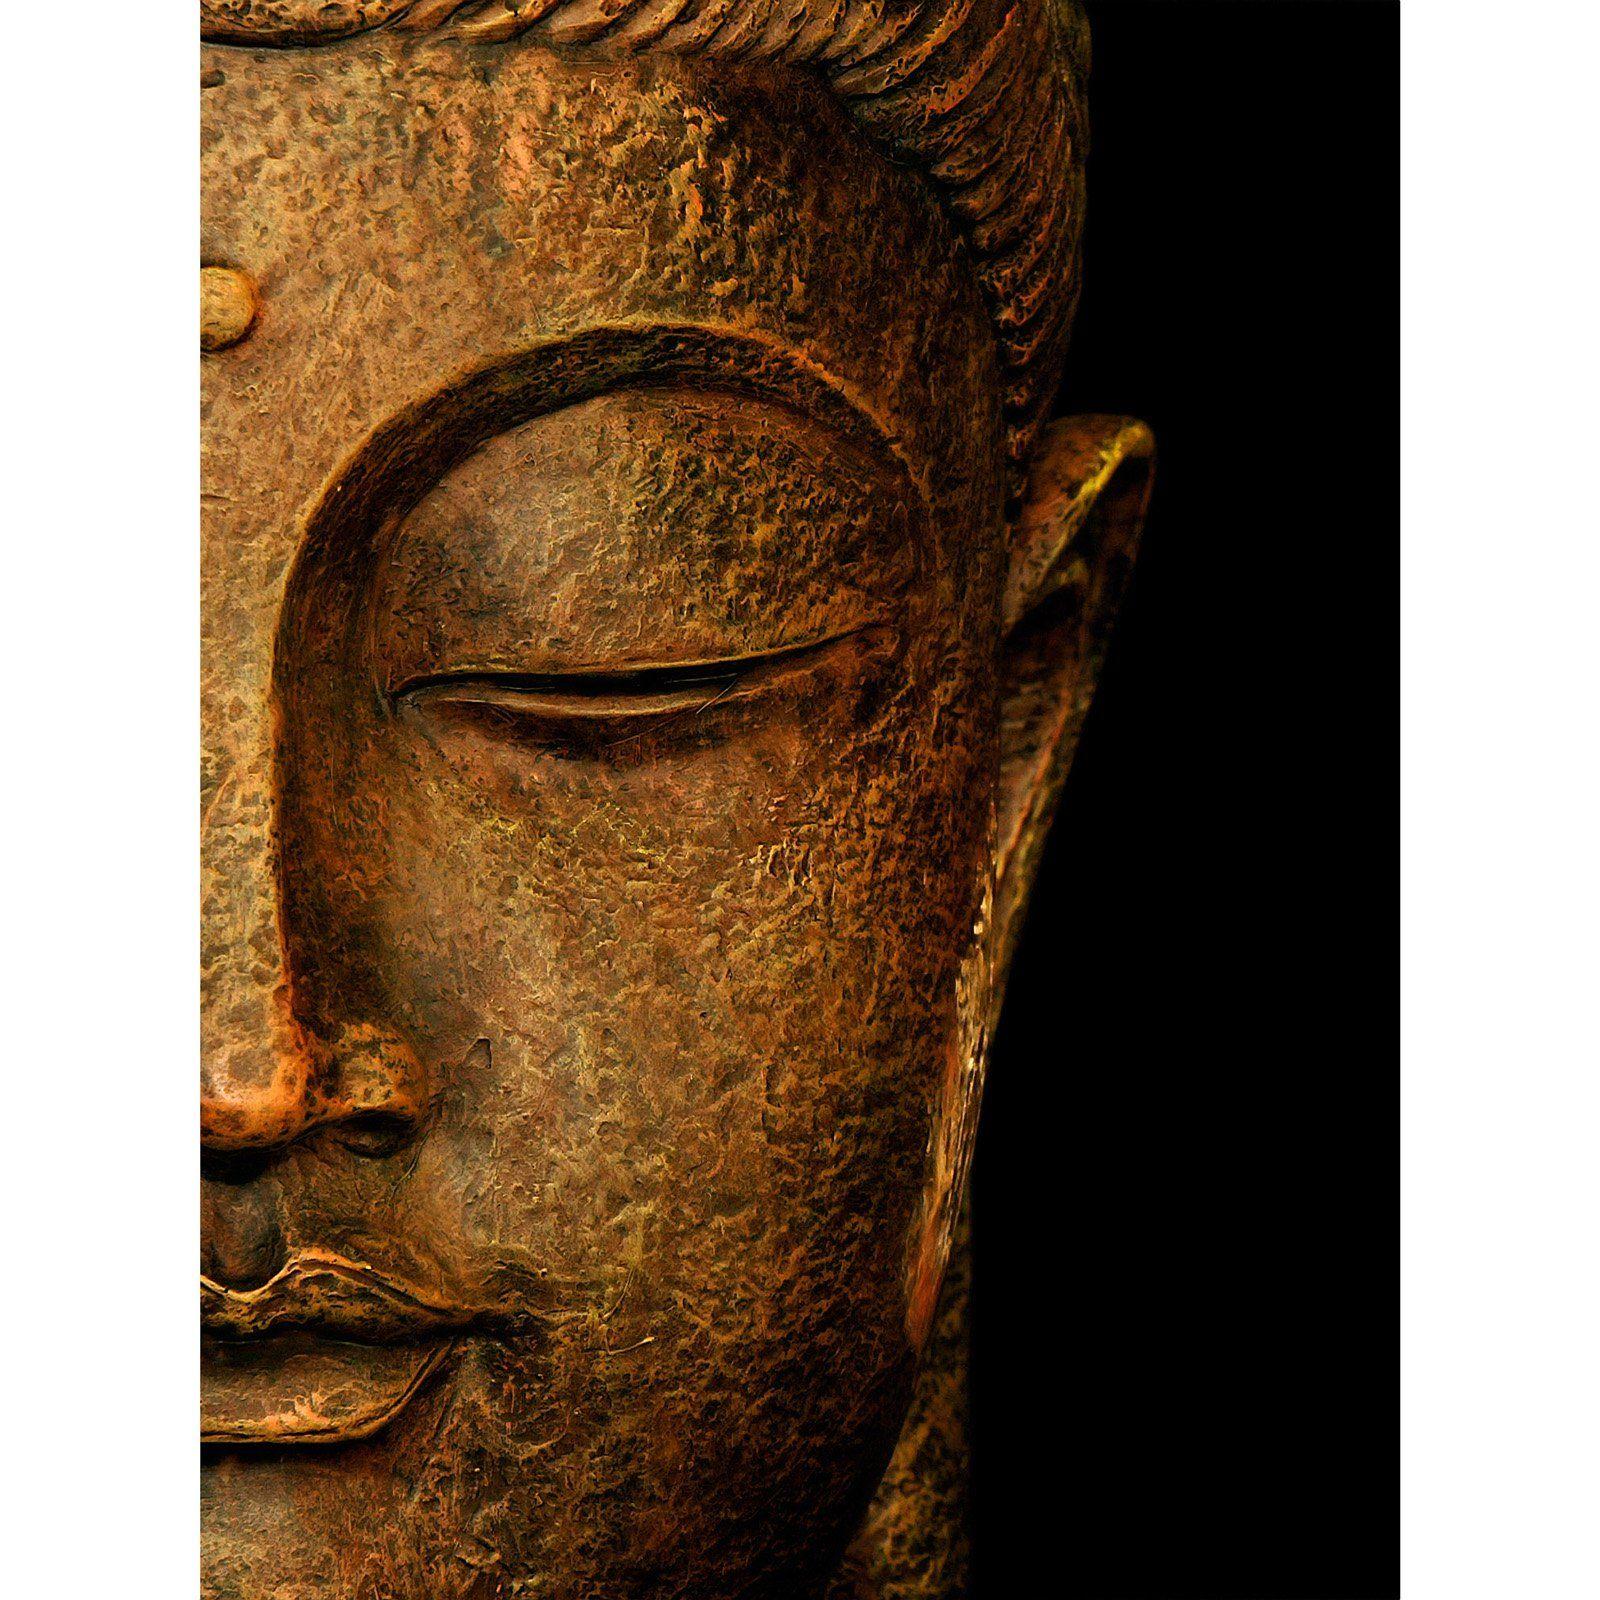 Oriental Furniture Serene Buddha Wall Art Buddha wall